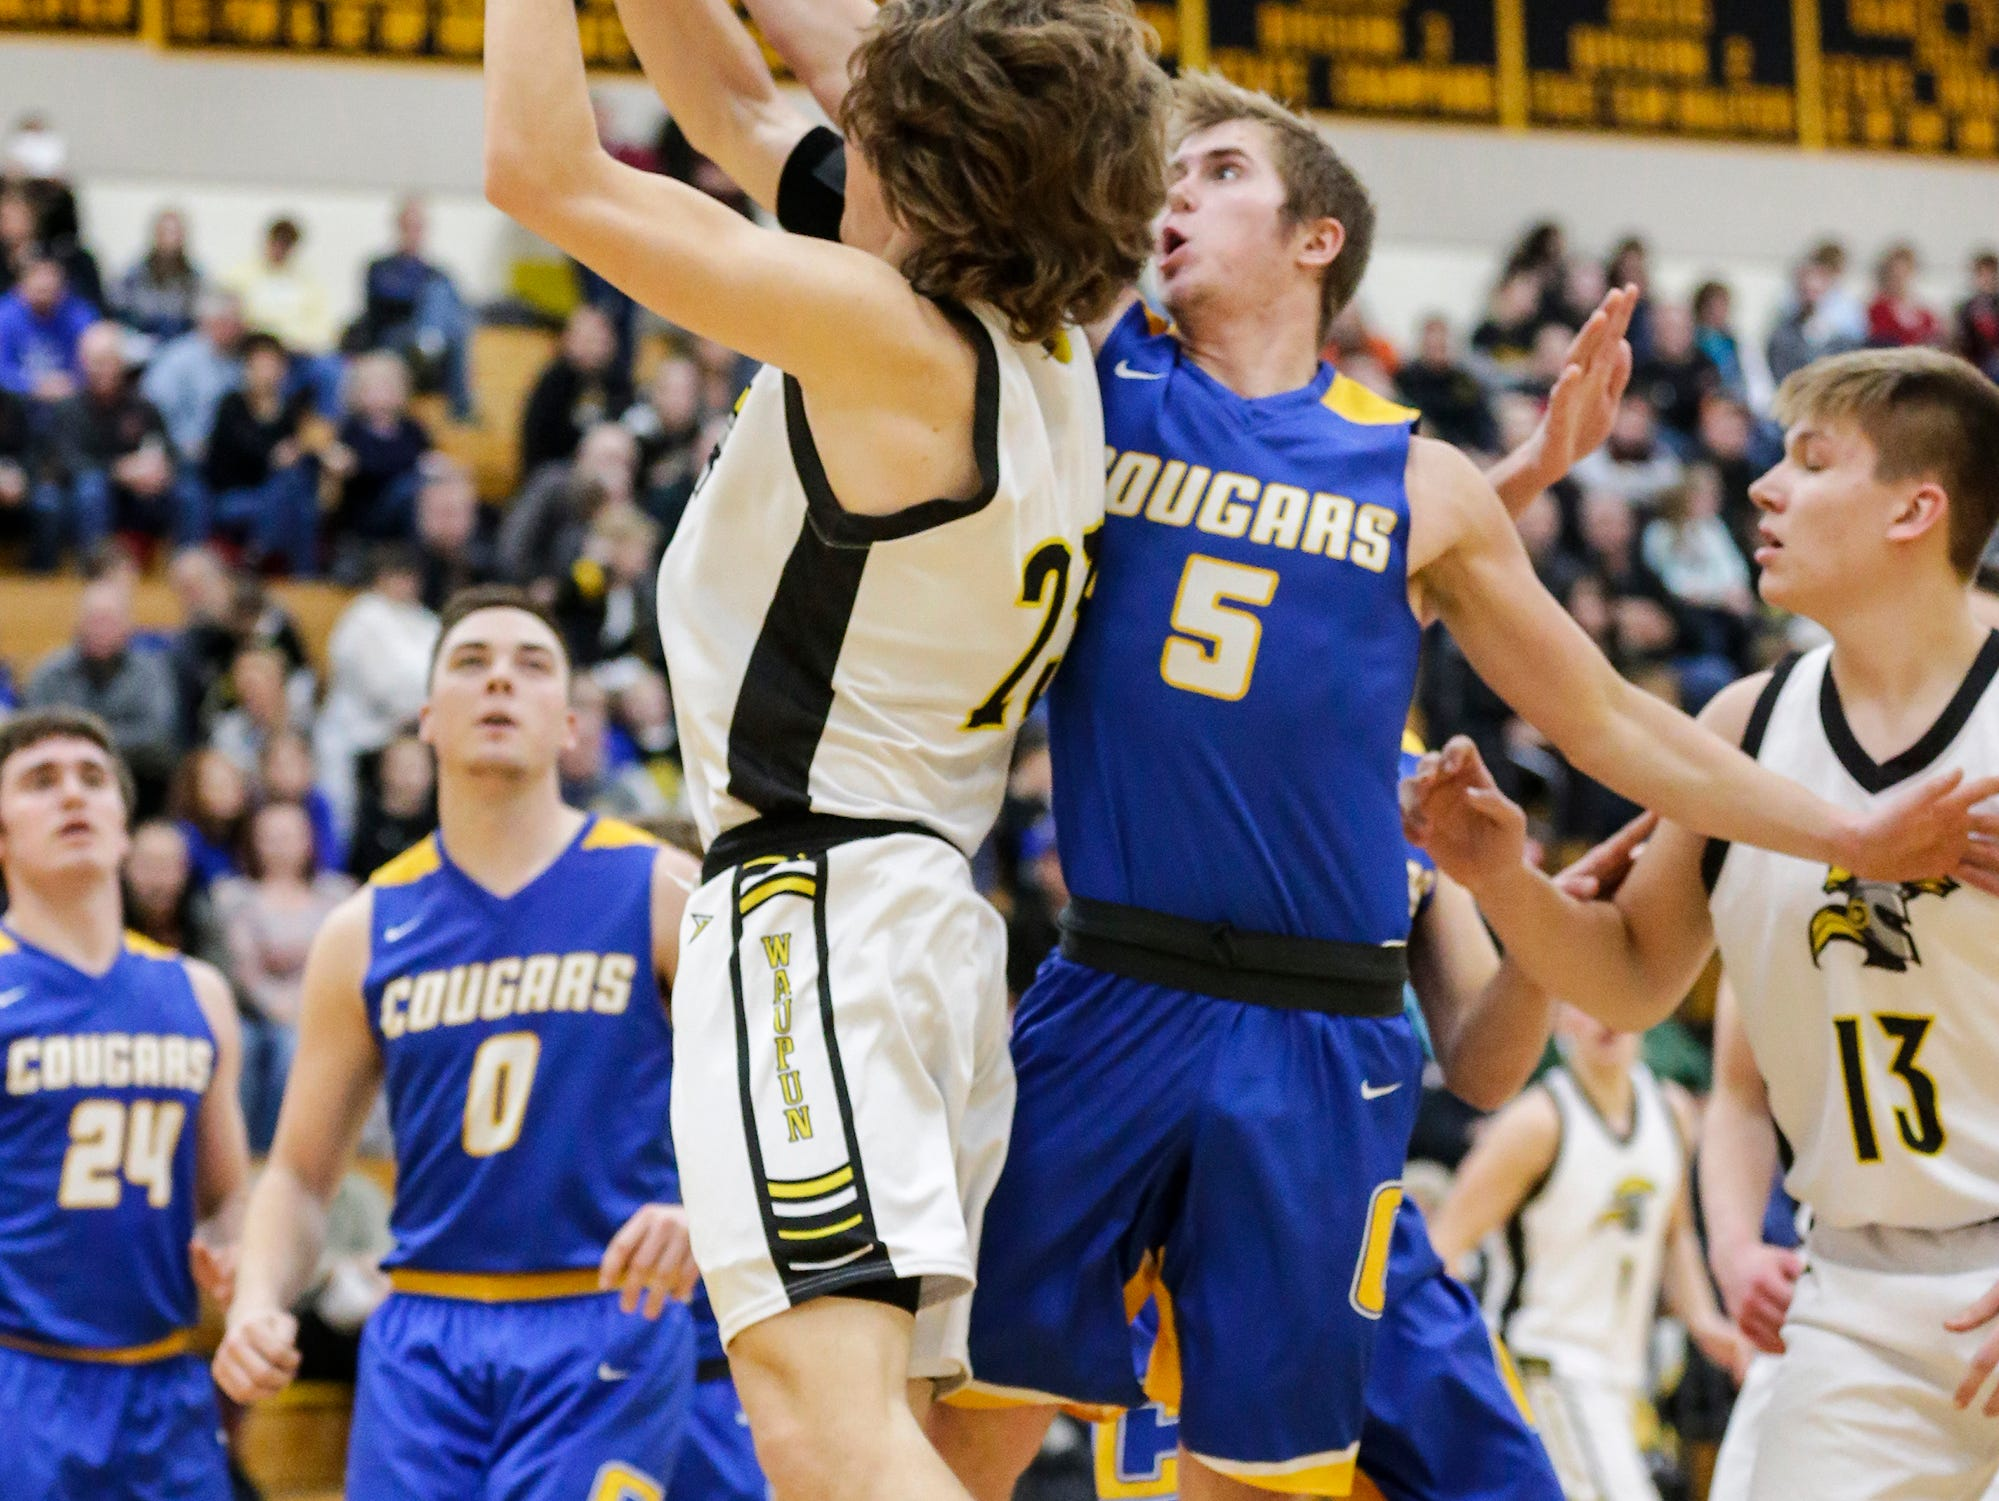 Waupun High School boys basketball's Reece Homan gets fouled by Campbellsport High School's Clay Hundertmark during their game Friday, December 14, 2018 in Waupun. Waupun won the game 64-33. Doug Raflik/USA TODAY NETWORK-Wisconsin